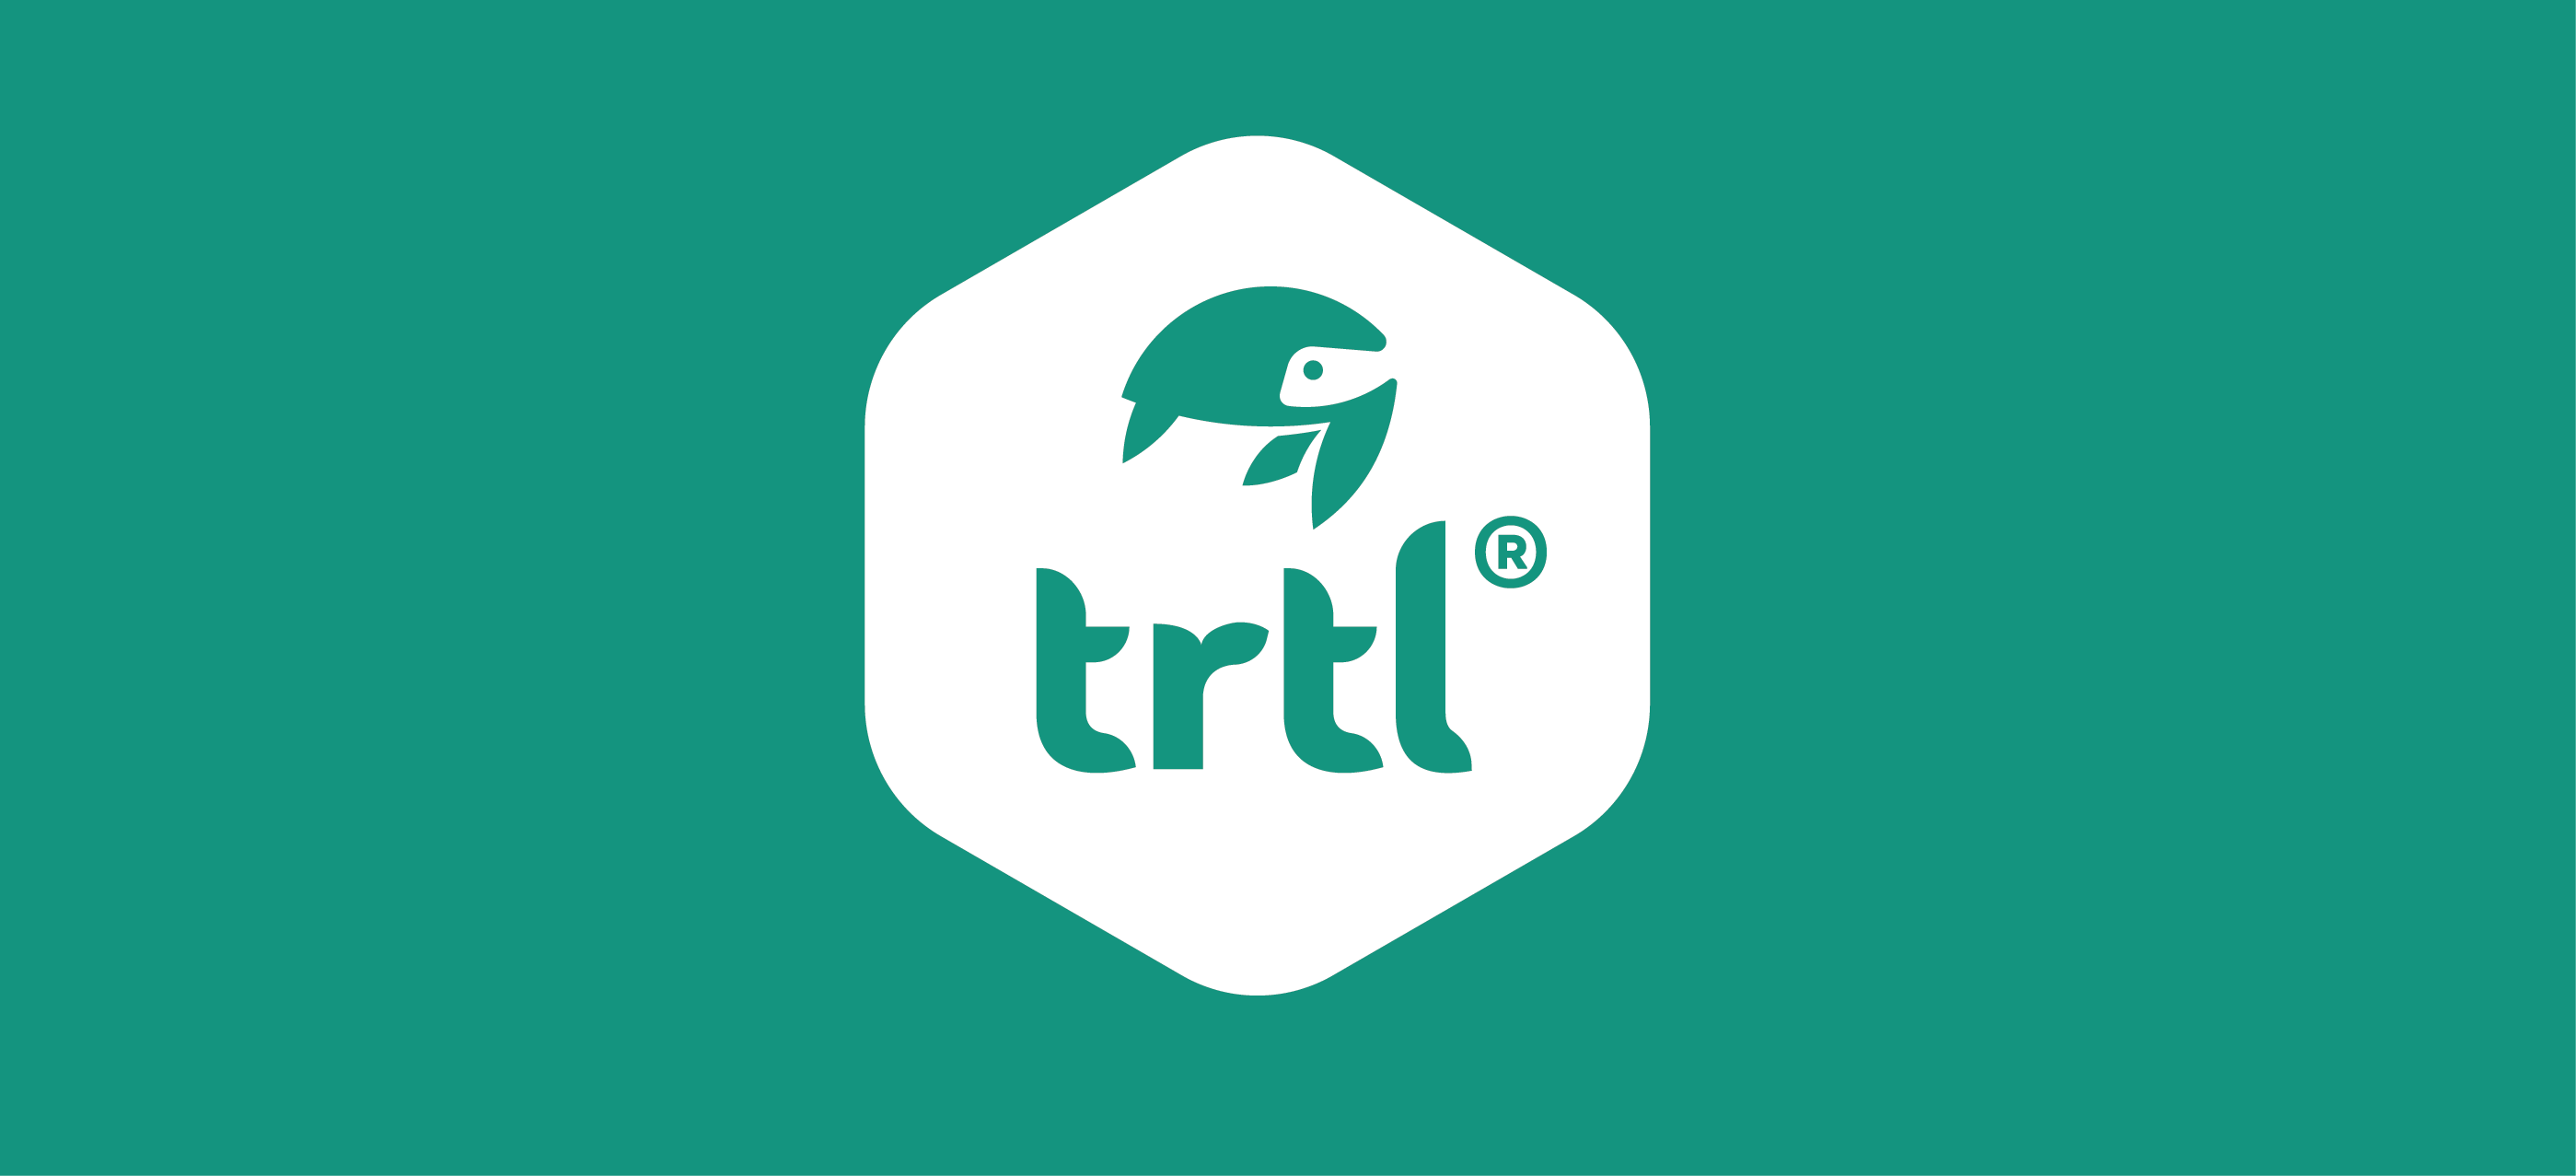 White_trtl_logo_green_turtle.png